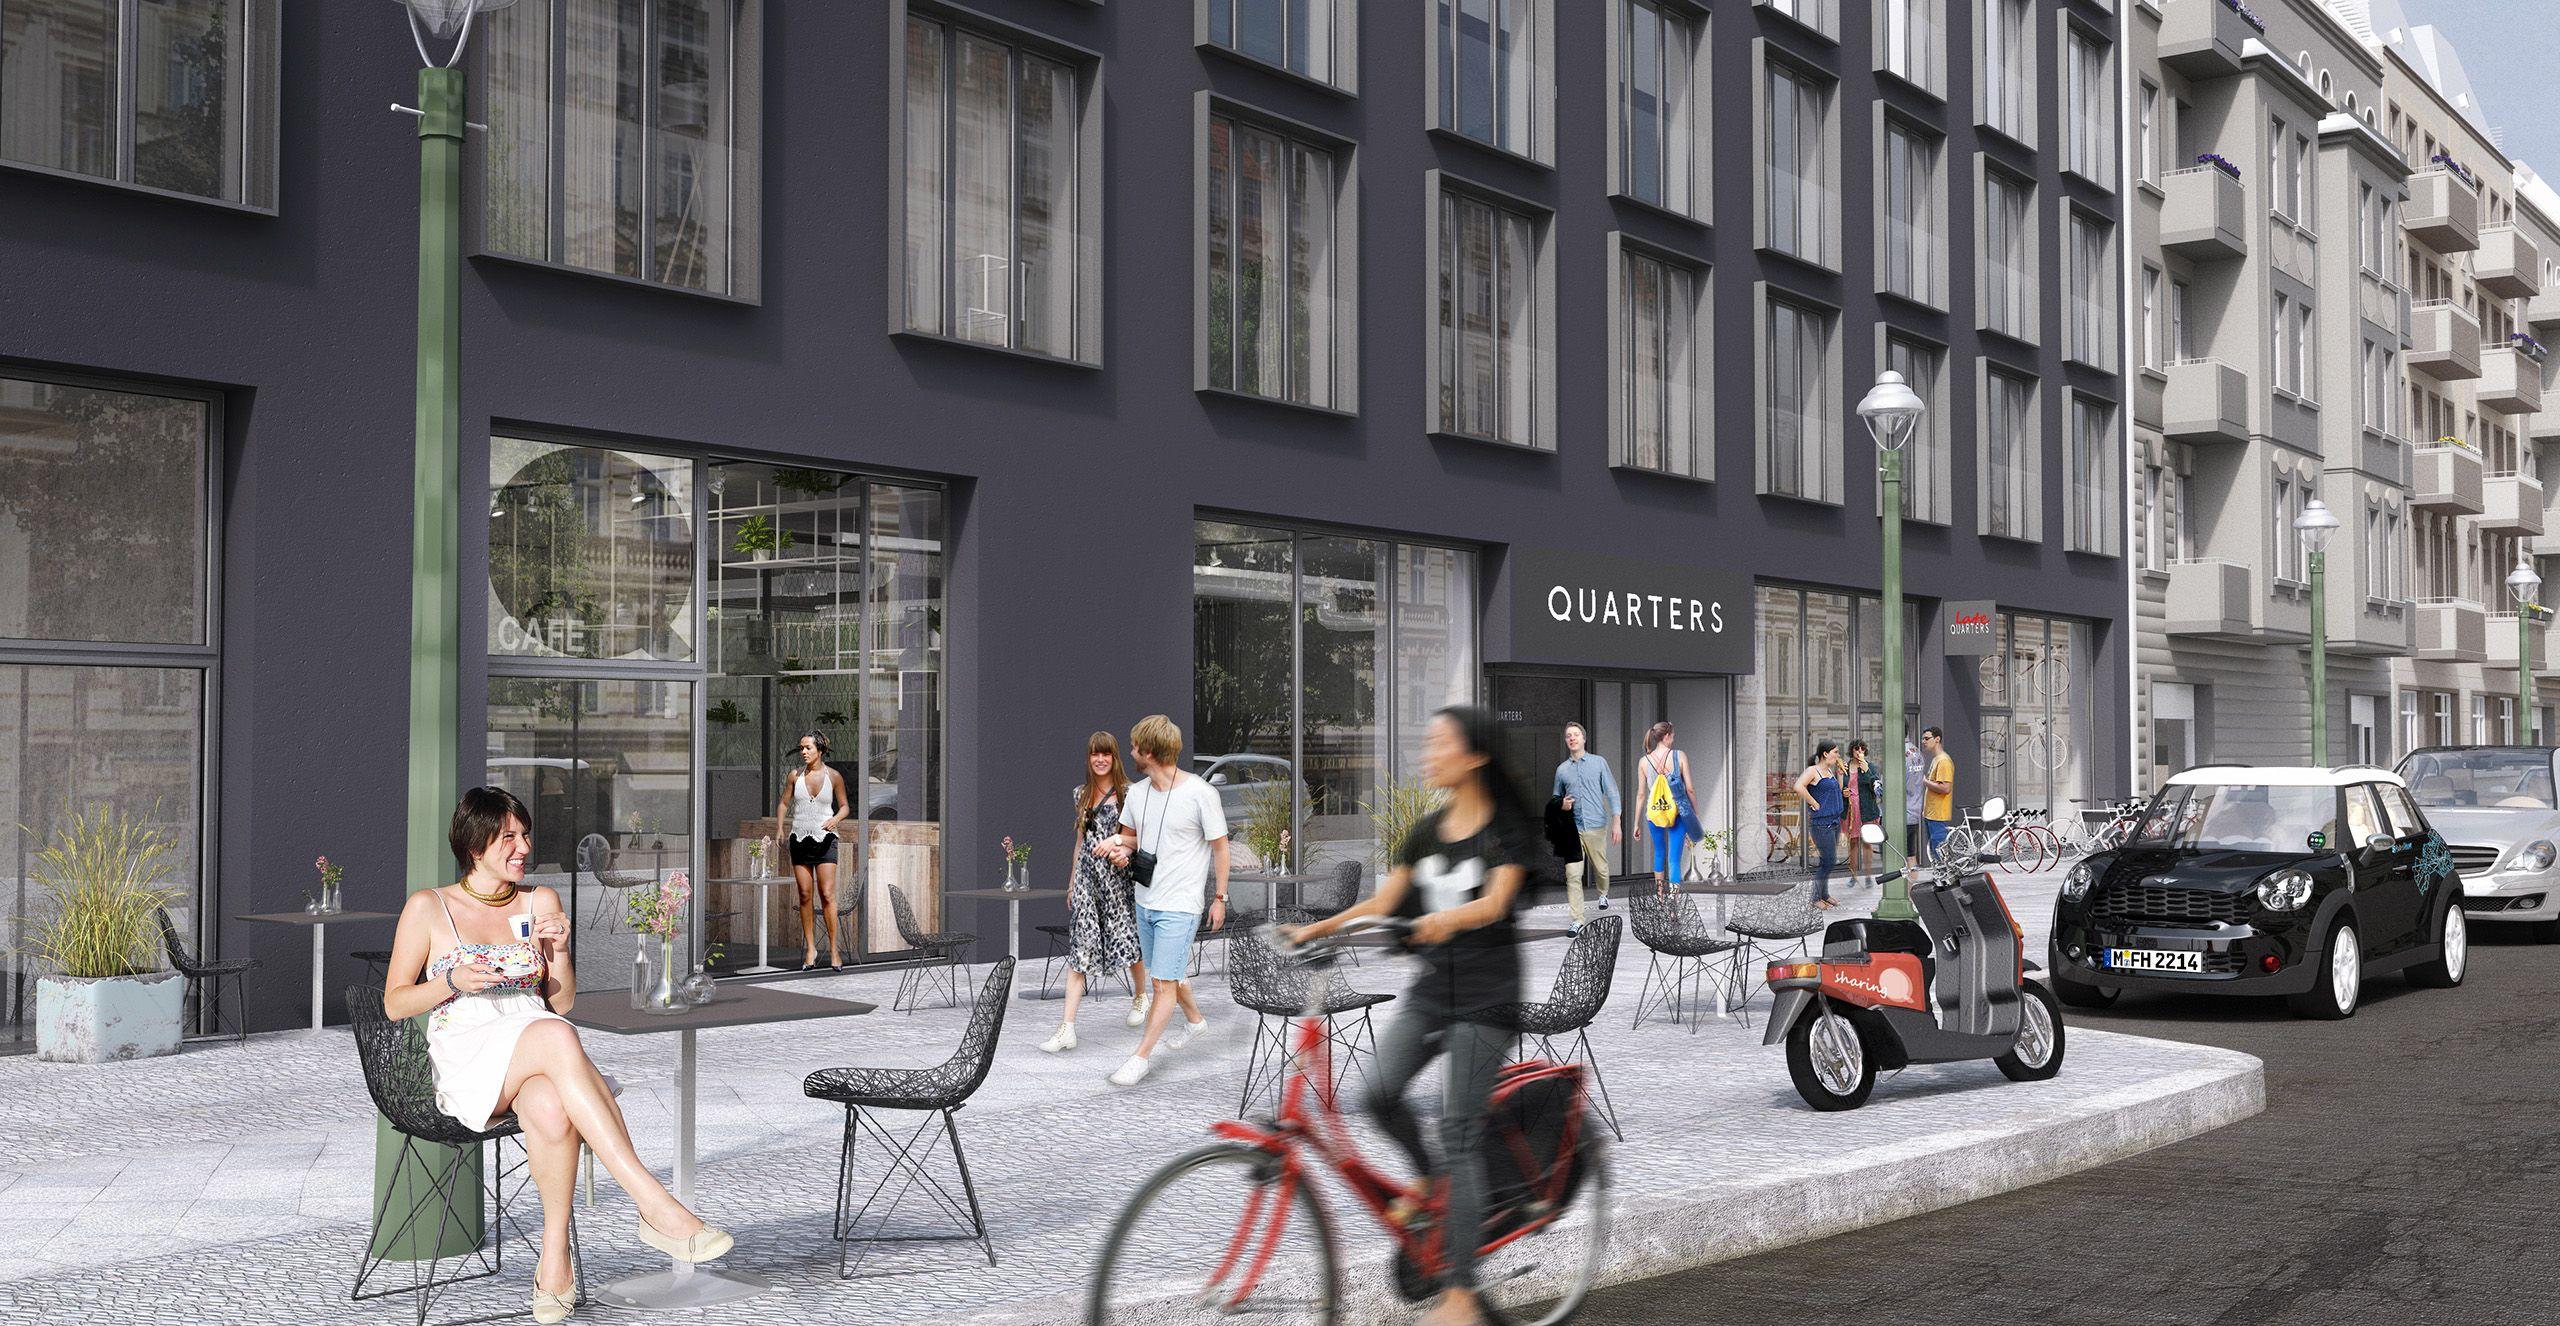 Visualisierung Berlin berlin mitte city quaters shared living render manufaktur